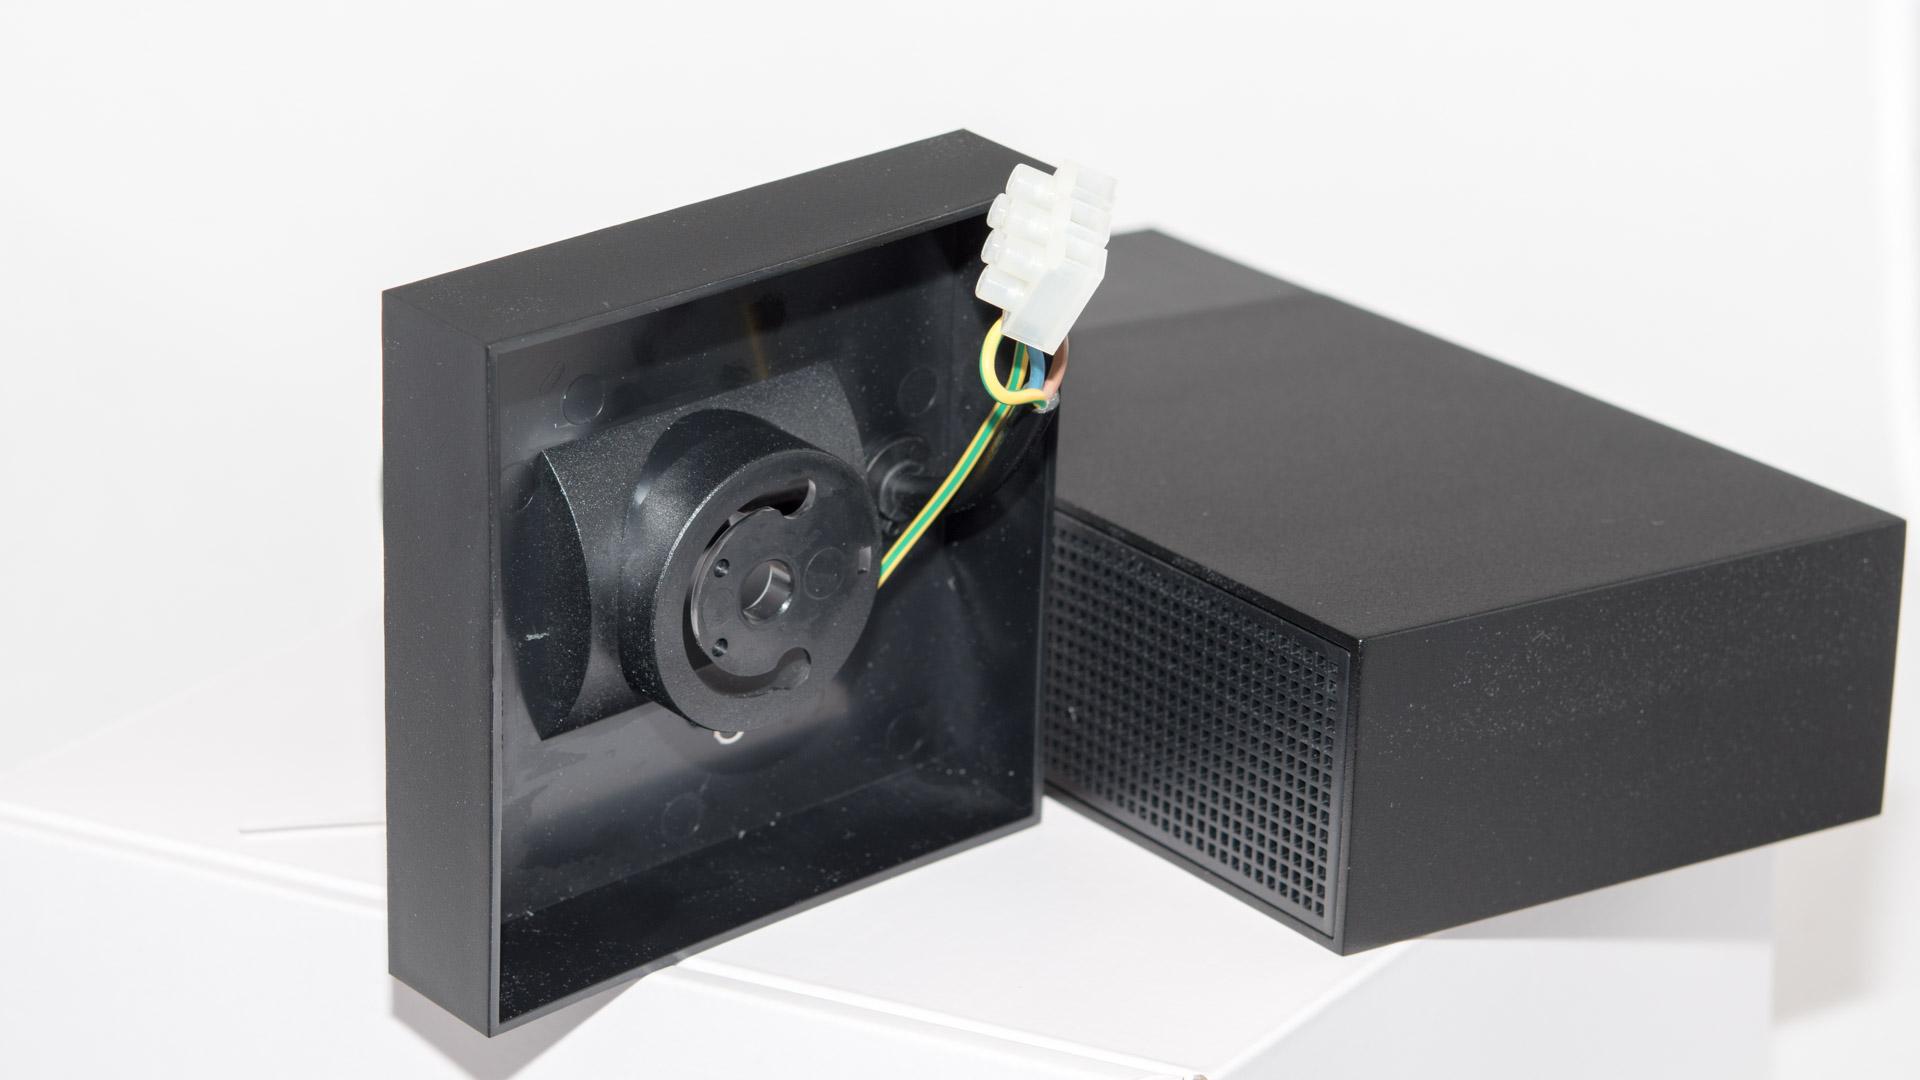 die netatmo presence intelligente berwachungskamera im test berwachungskamera mit ki techtest. Black Bedroom Furniture Sets. Home Design Ideas